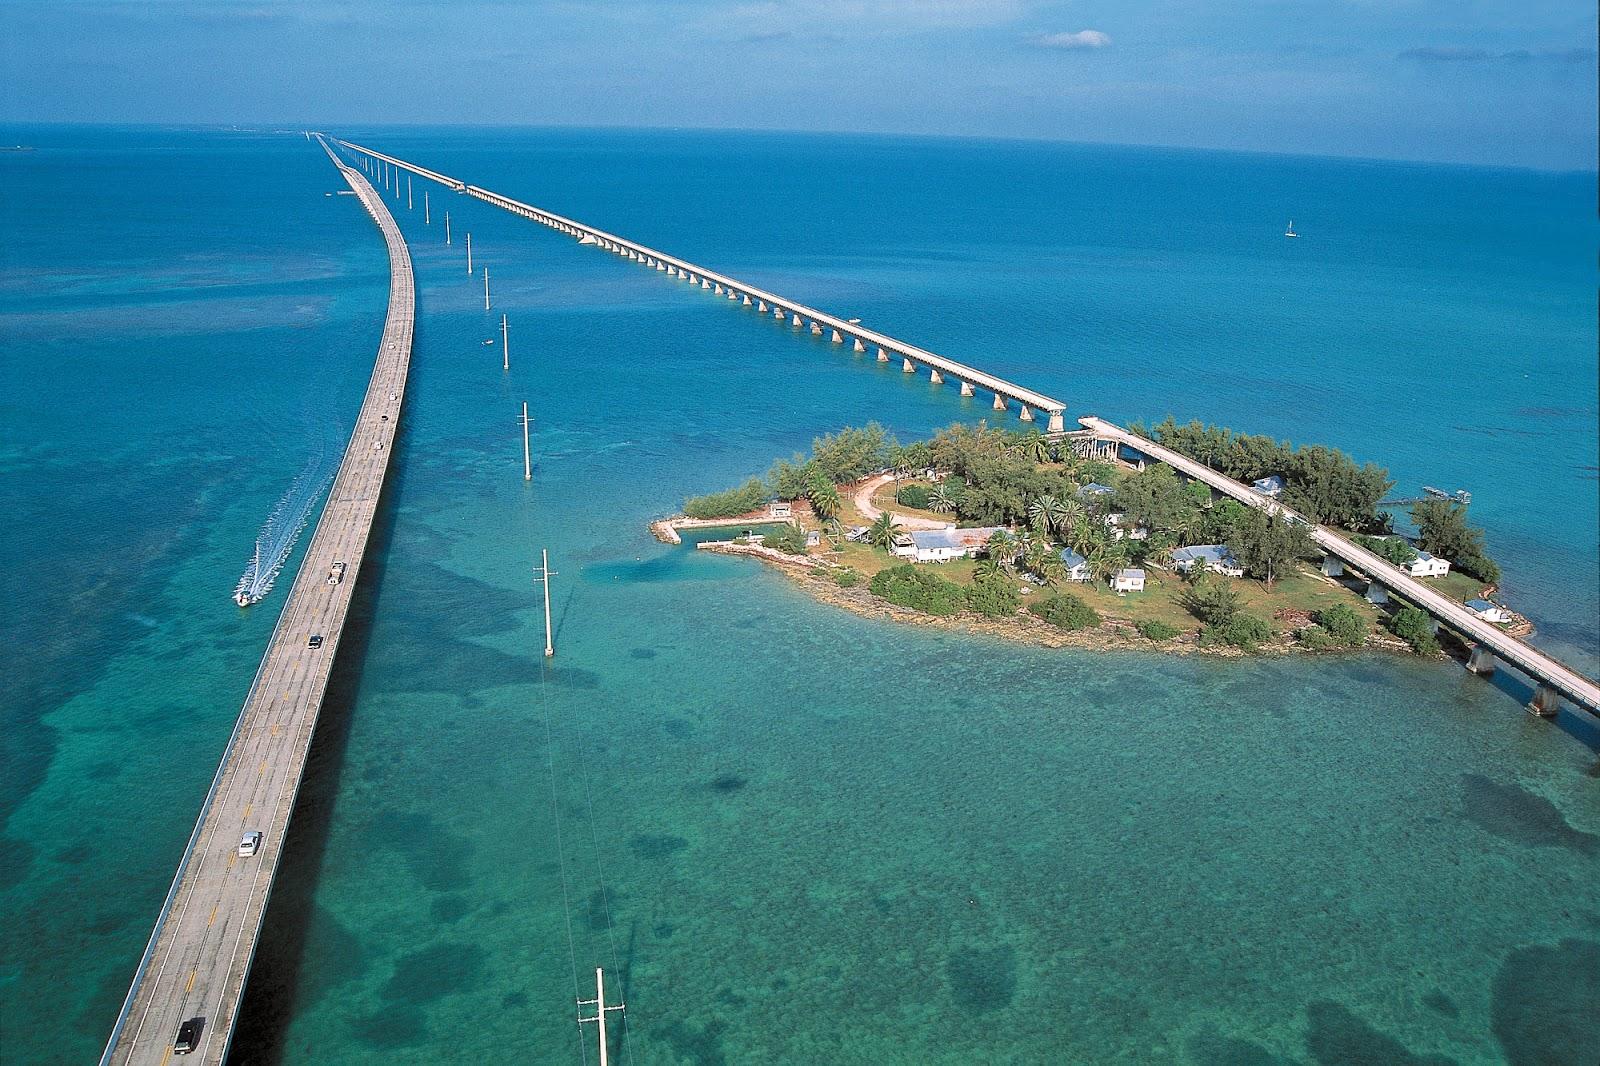 Free Download Florida Keys Resorts On The Beach Wallpaper Hd